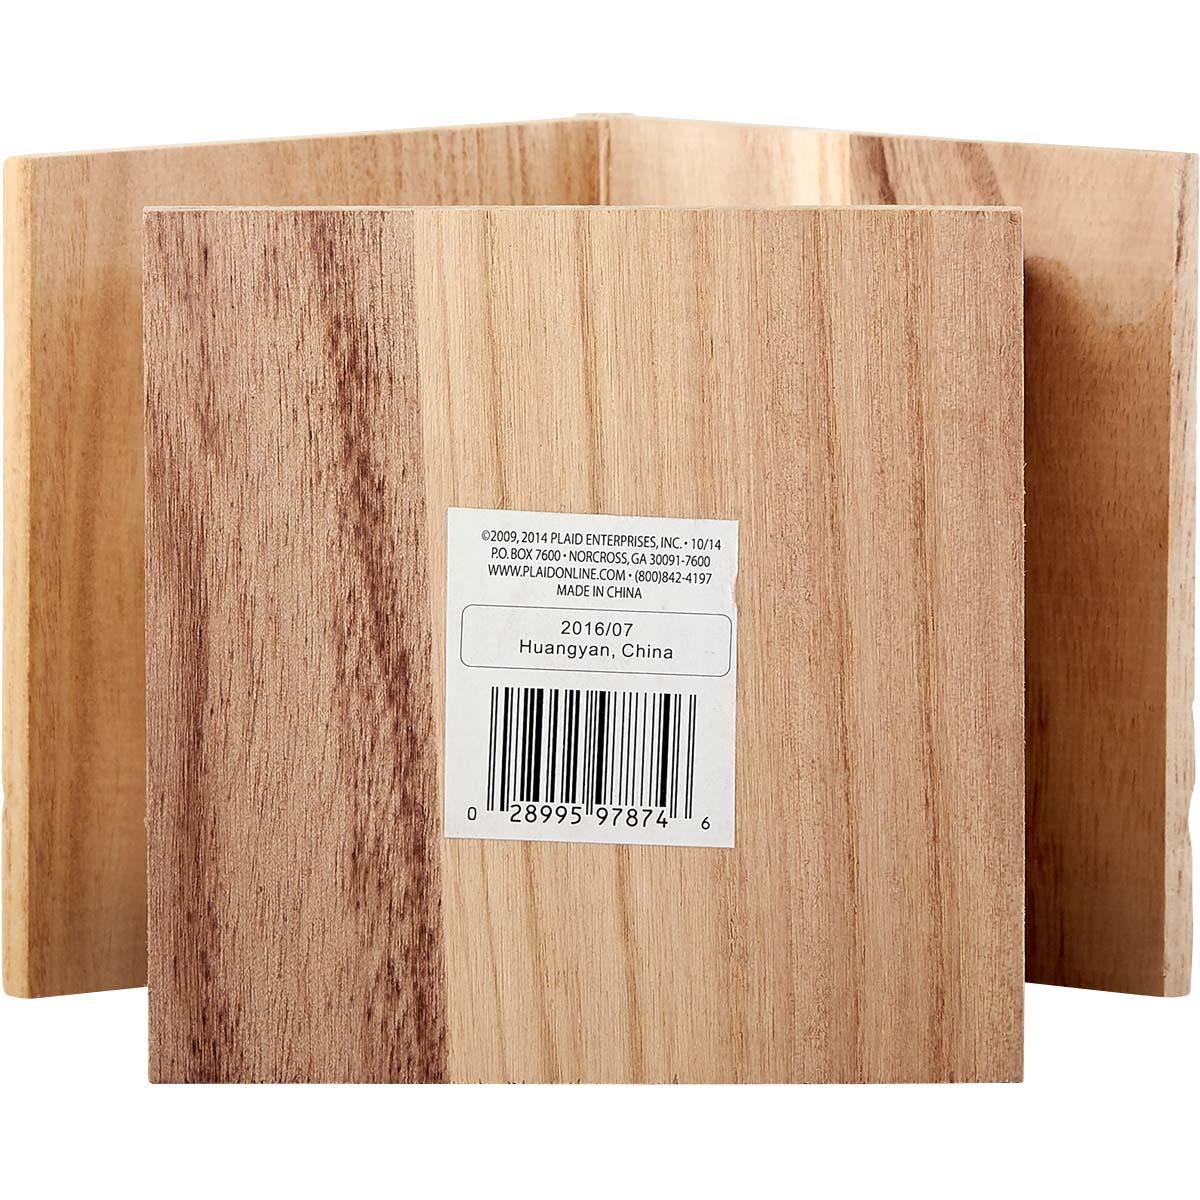 Plaid ® Wood Surfaces - Birdhouses - Large - 97874